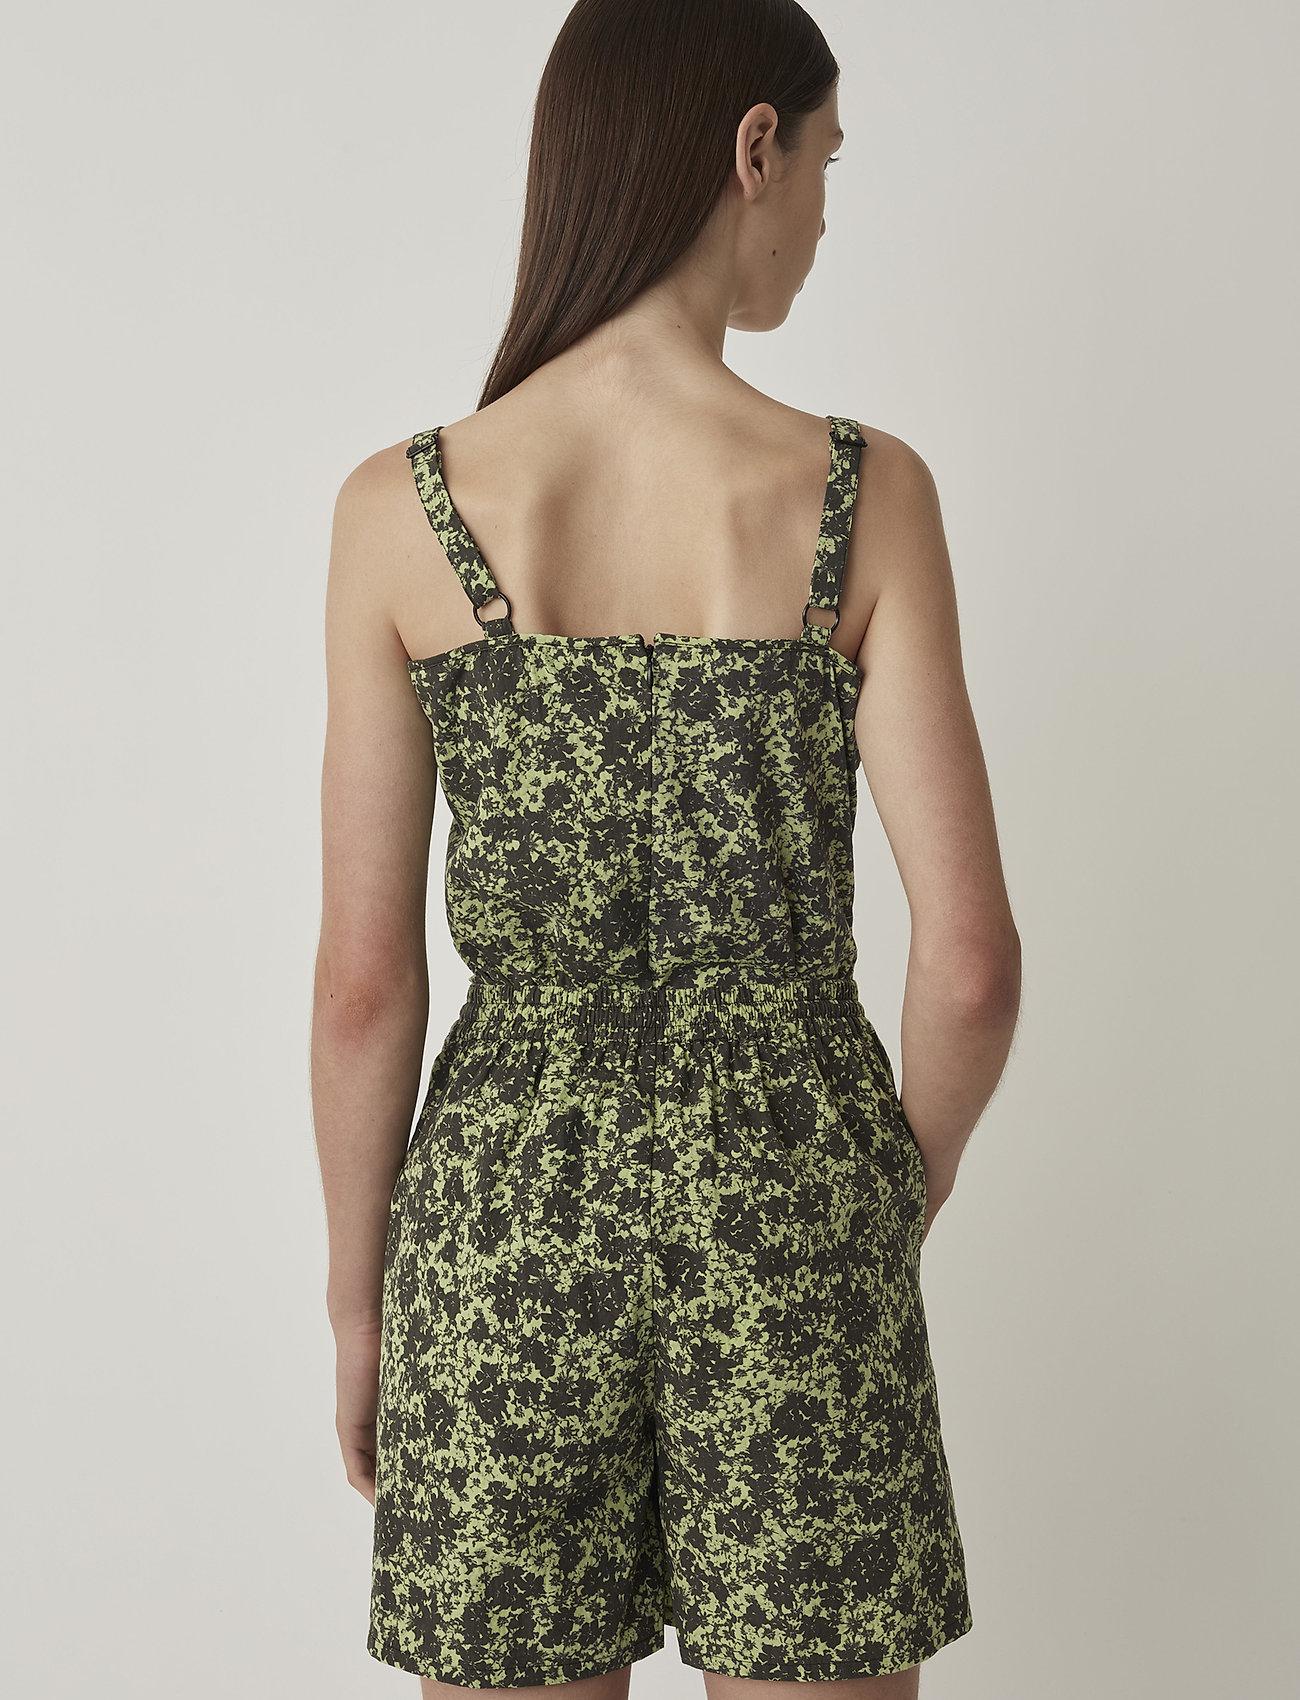 Alicia Shorts (Tropical Sap Green) (28.50 €) - Just Female IAzz3